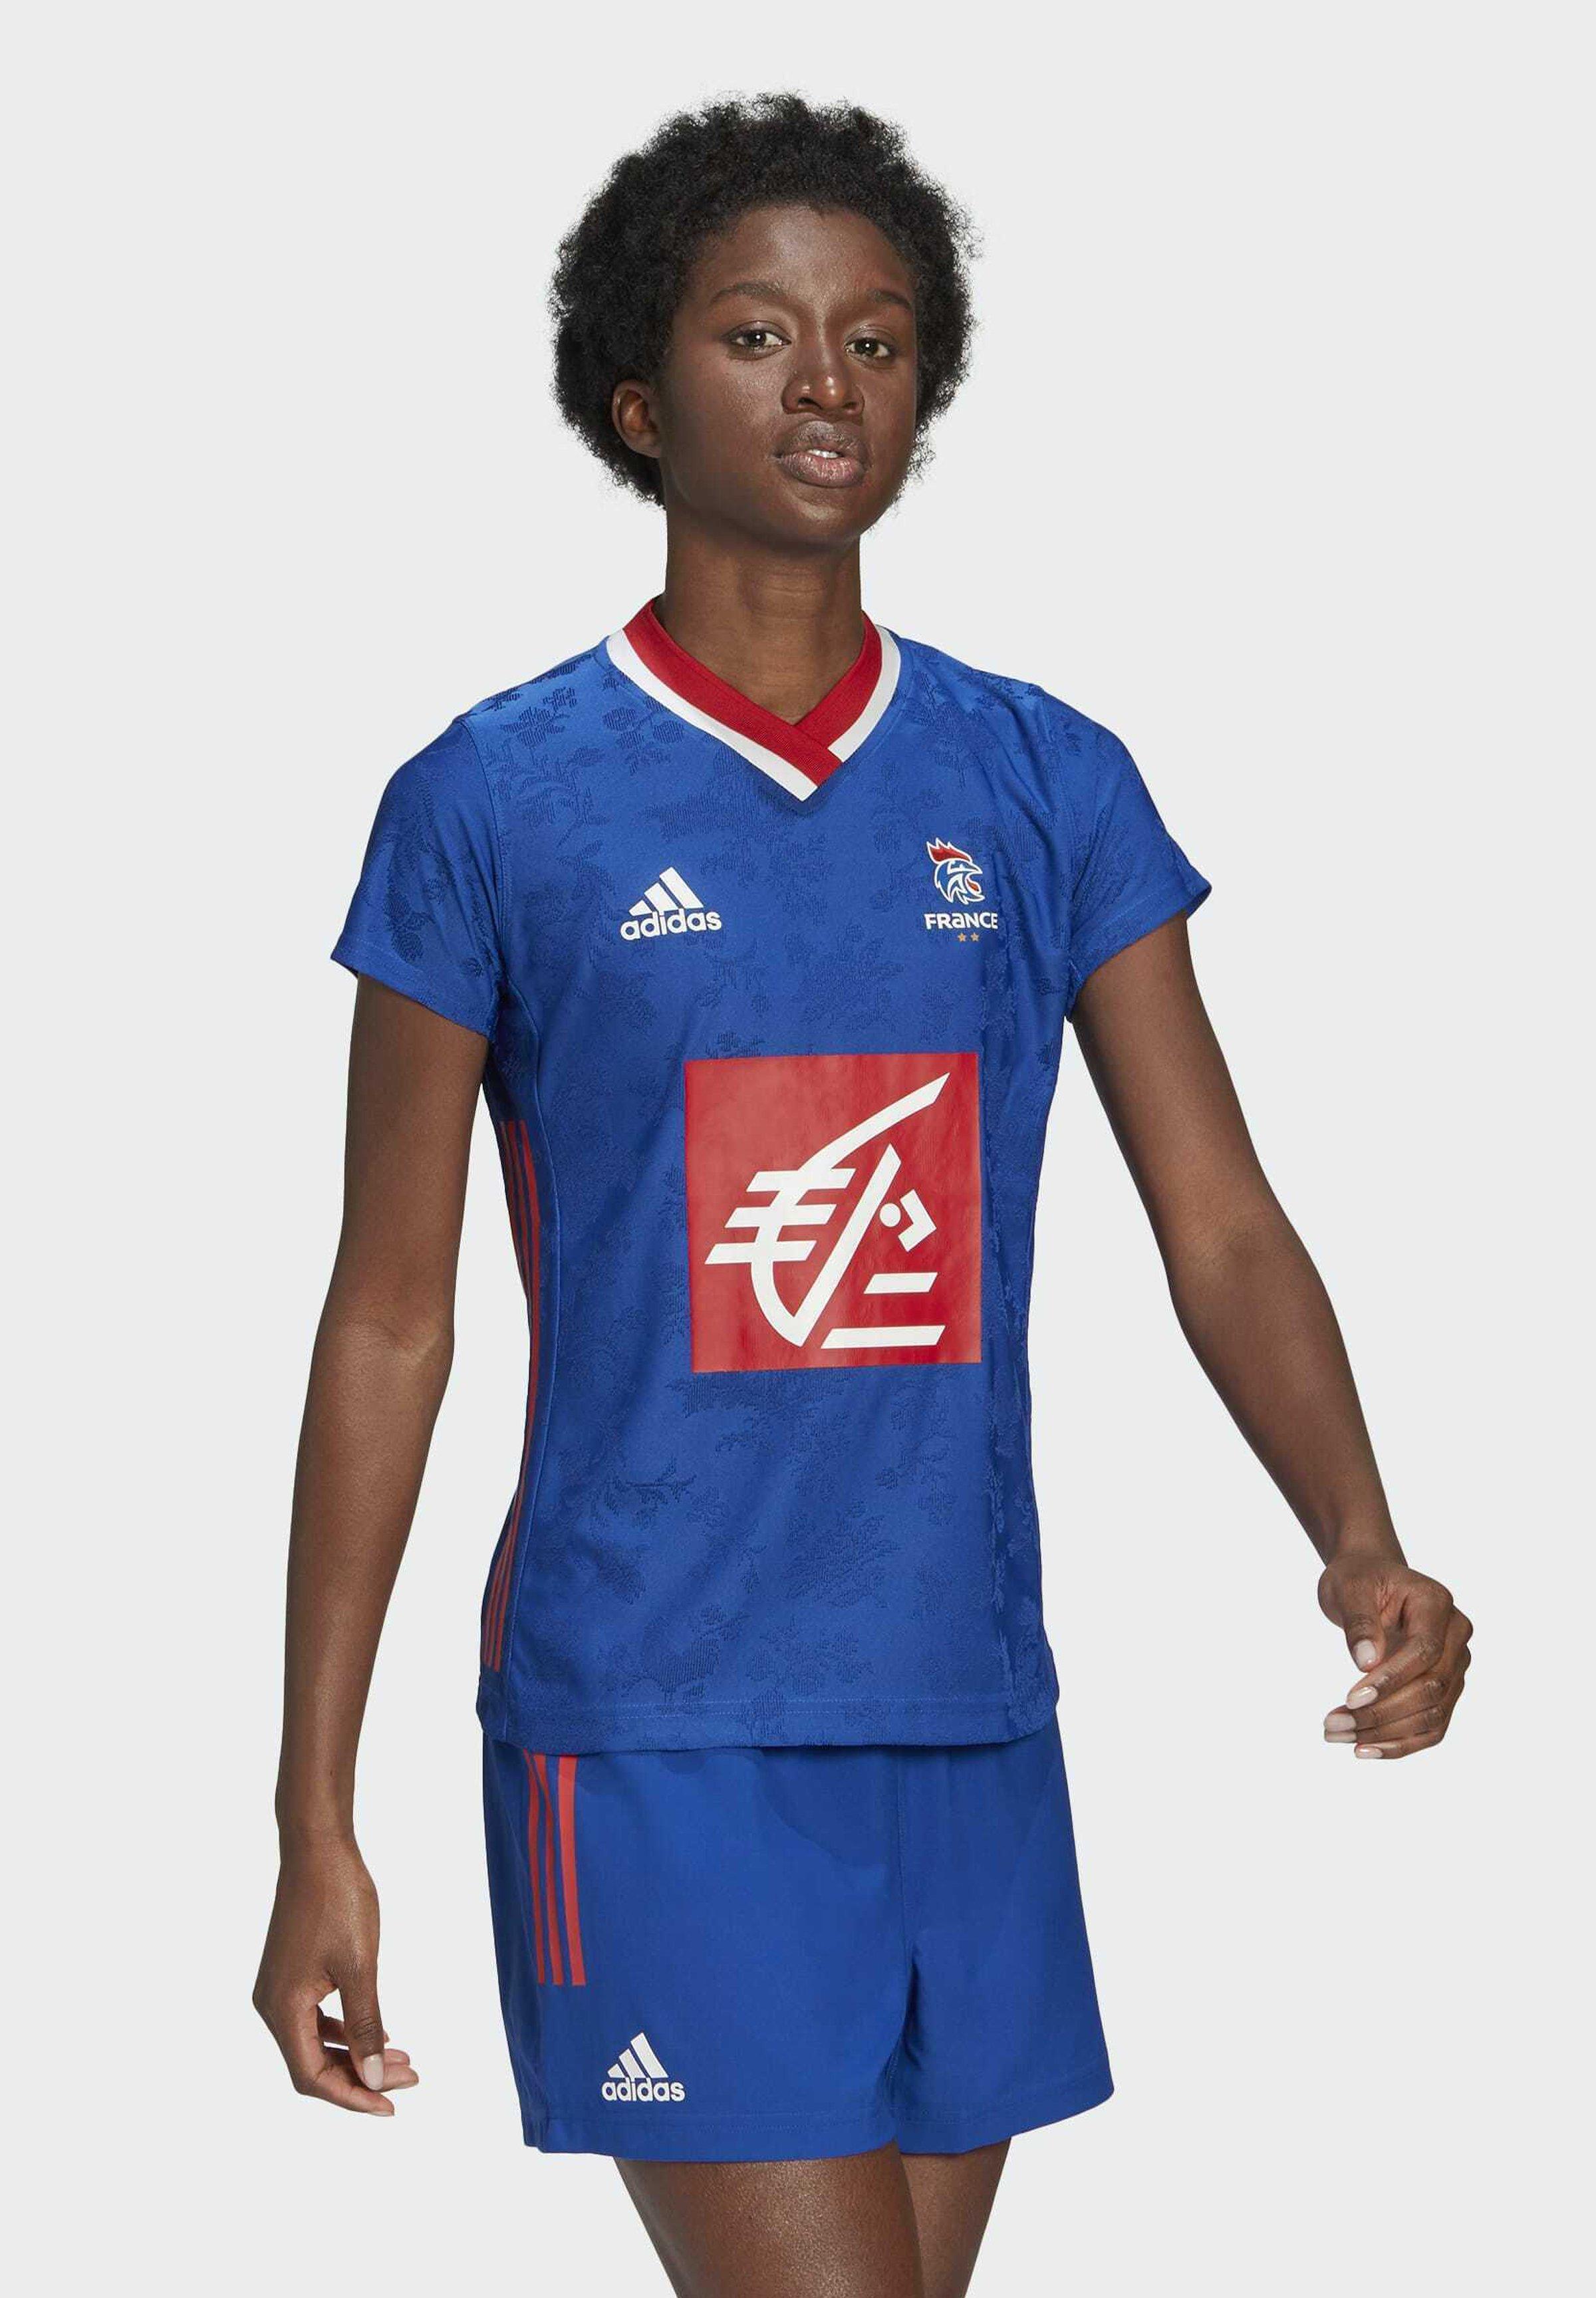 Women FFHB REP W HB PERFORMANCE AEROREADY PRIMEGREEN HANDBALL FITTED JERSEY - National team wear